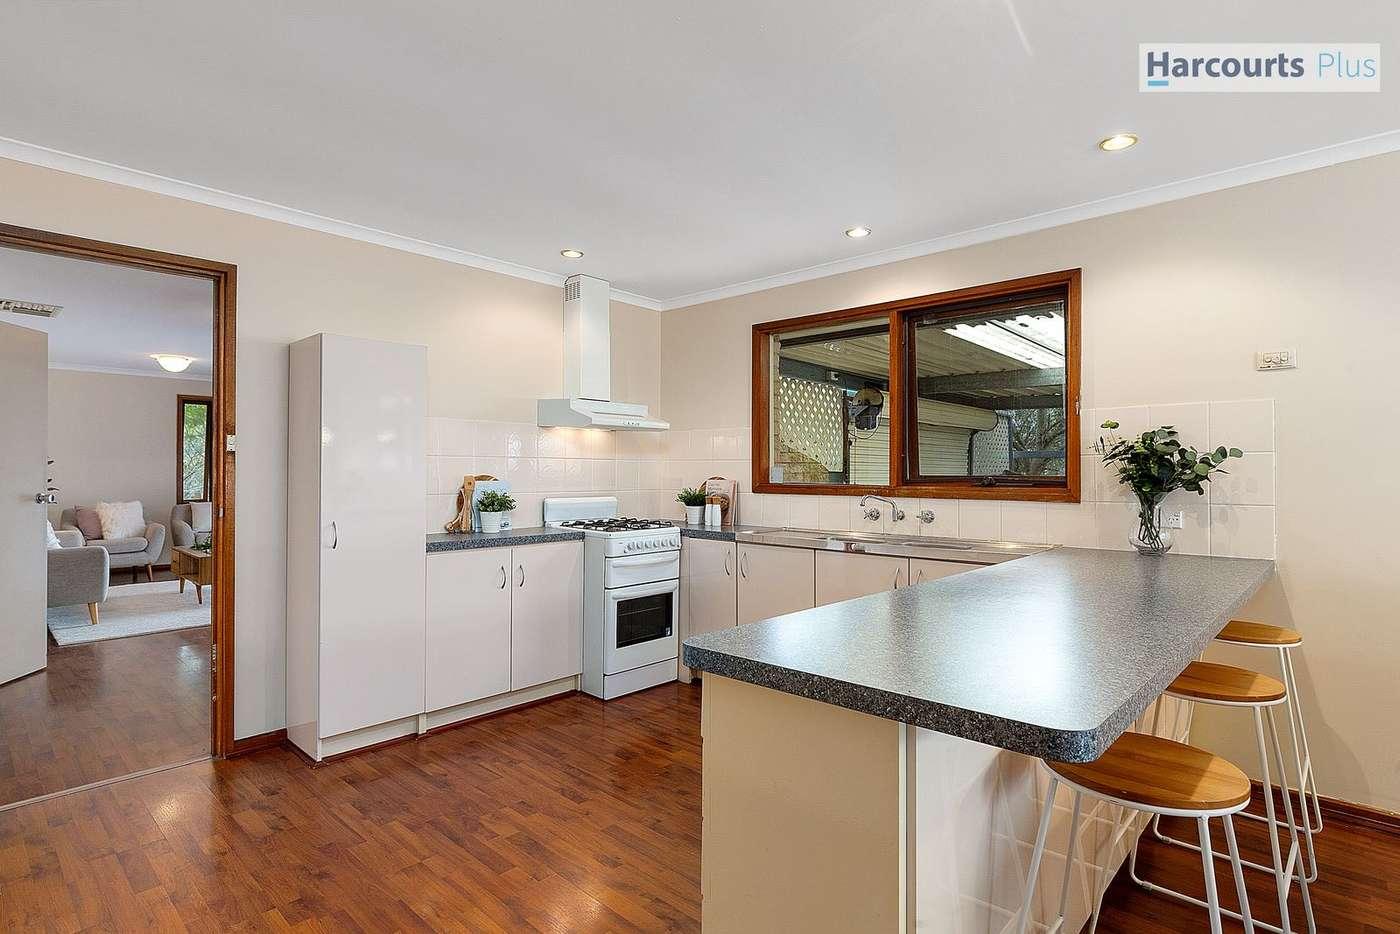 Fifth view of Homely house listing, 4 Birubi Way, Morphett Vale SA 5162